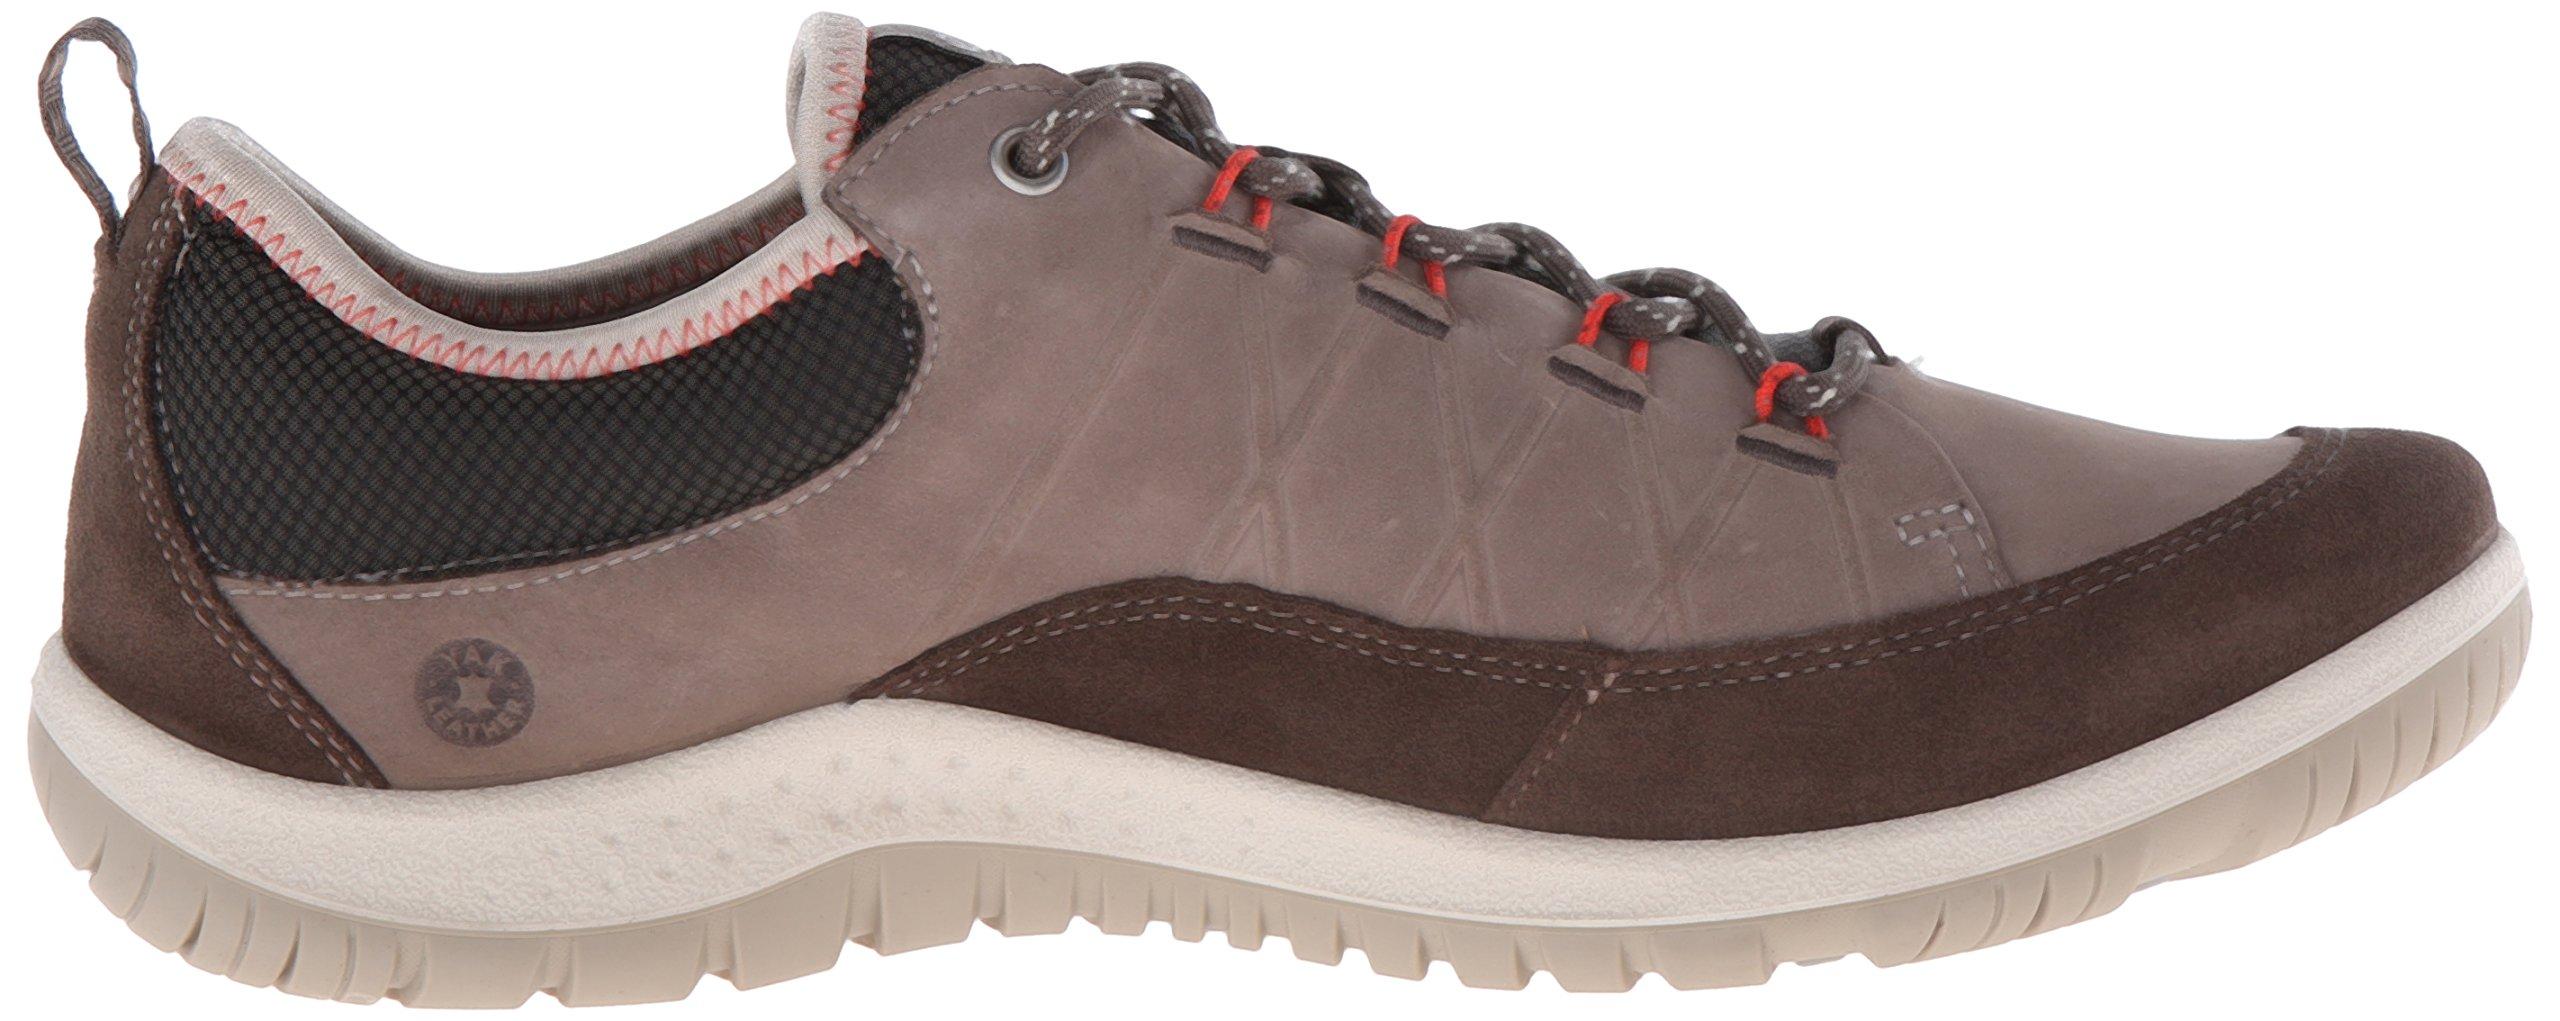 81YnfGyDrkL - ECCO Women's Aspina Multisport Outdoor Shoes